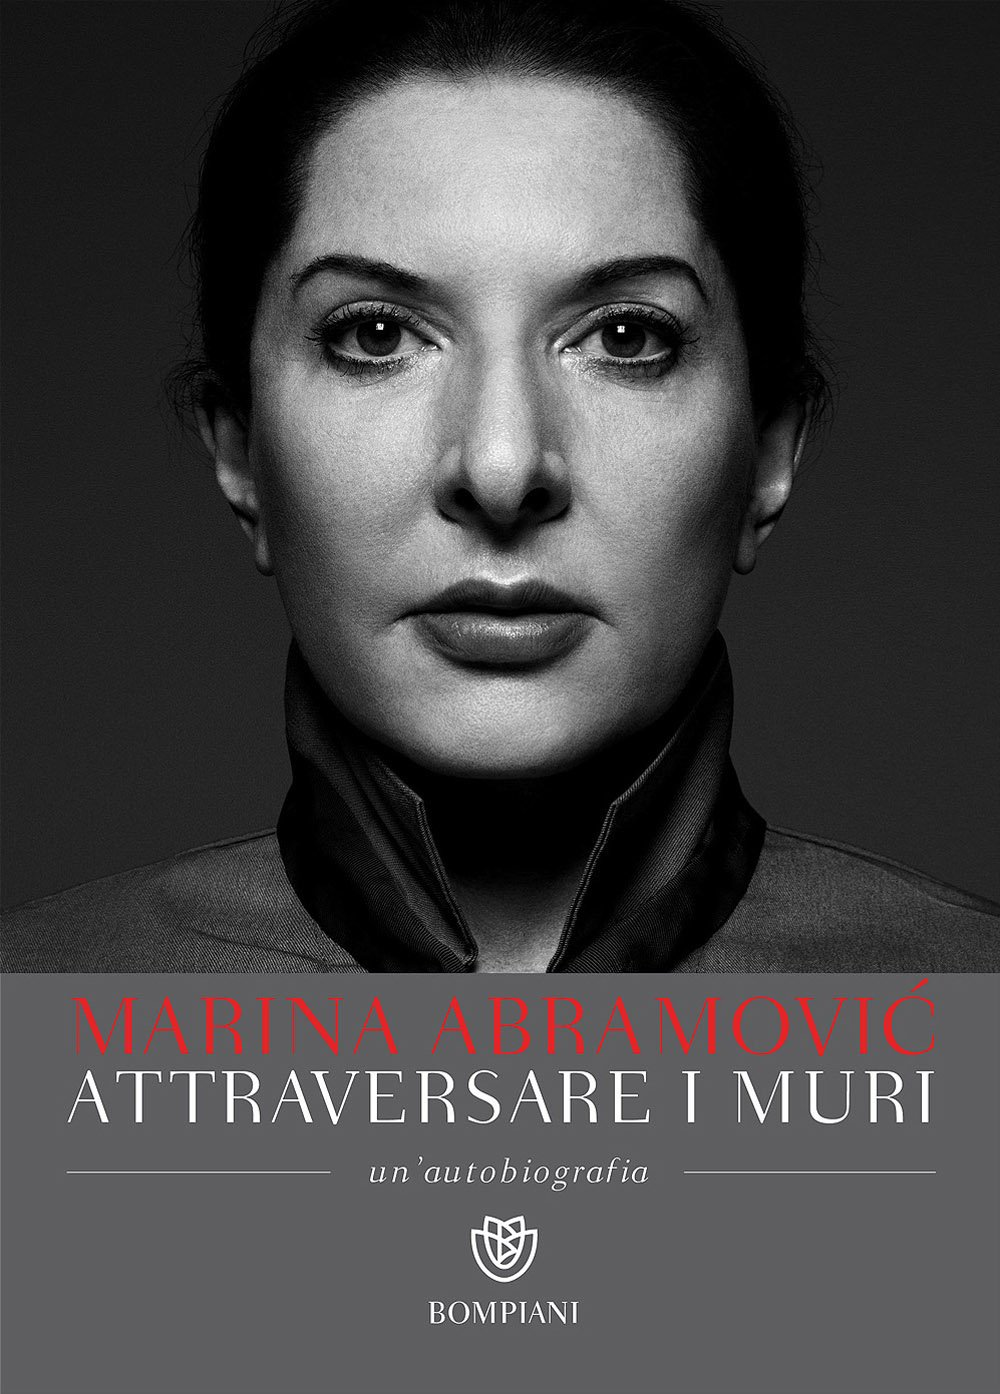 Attraversare i muri. Un'autobiografia: 1 Copertina flessibile – 24 nov 2016 Marina Abramovic James Kaplan A. Pezzotta Bompiani